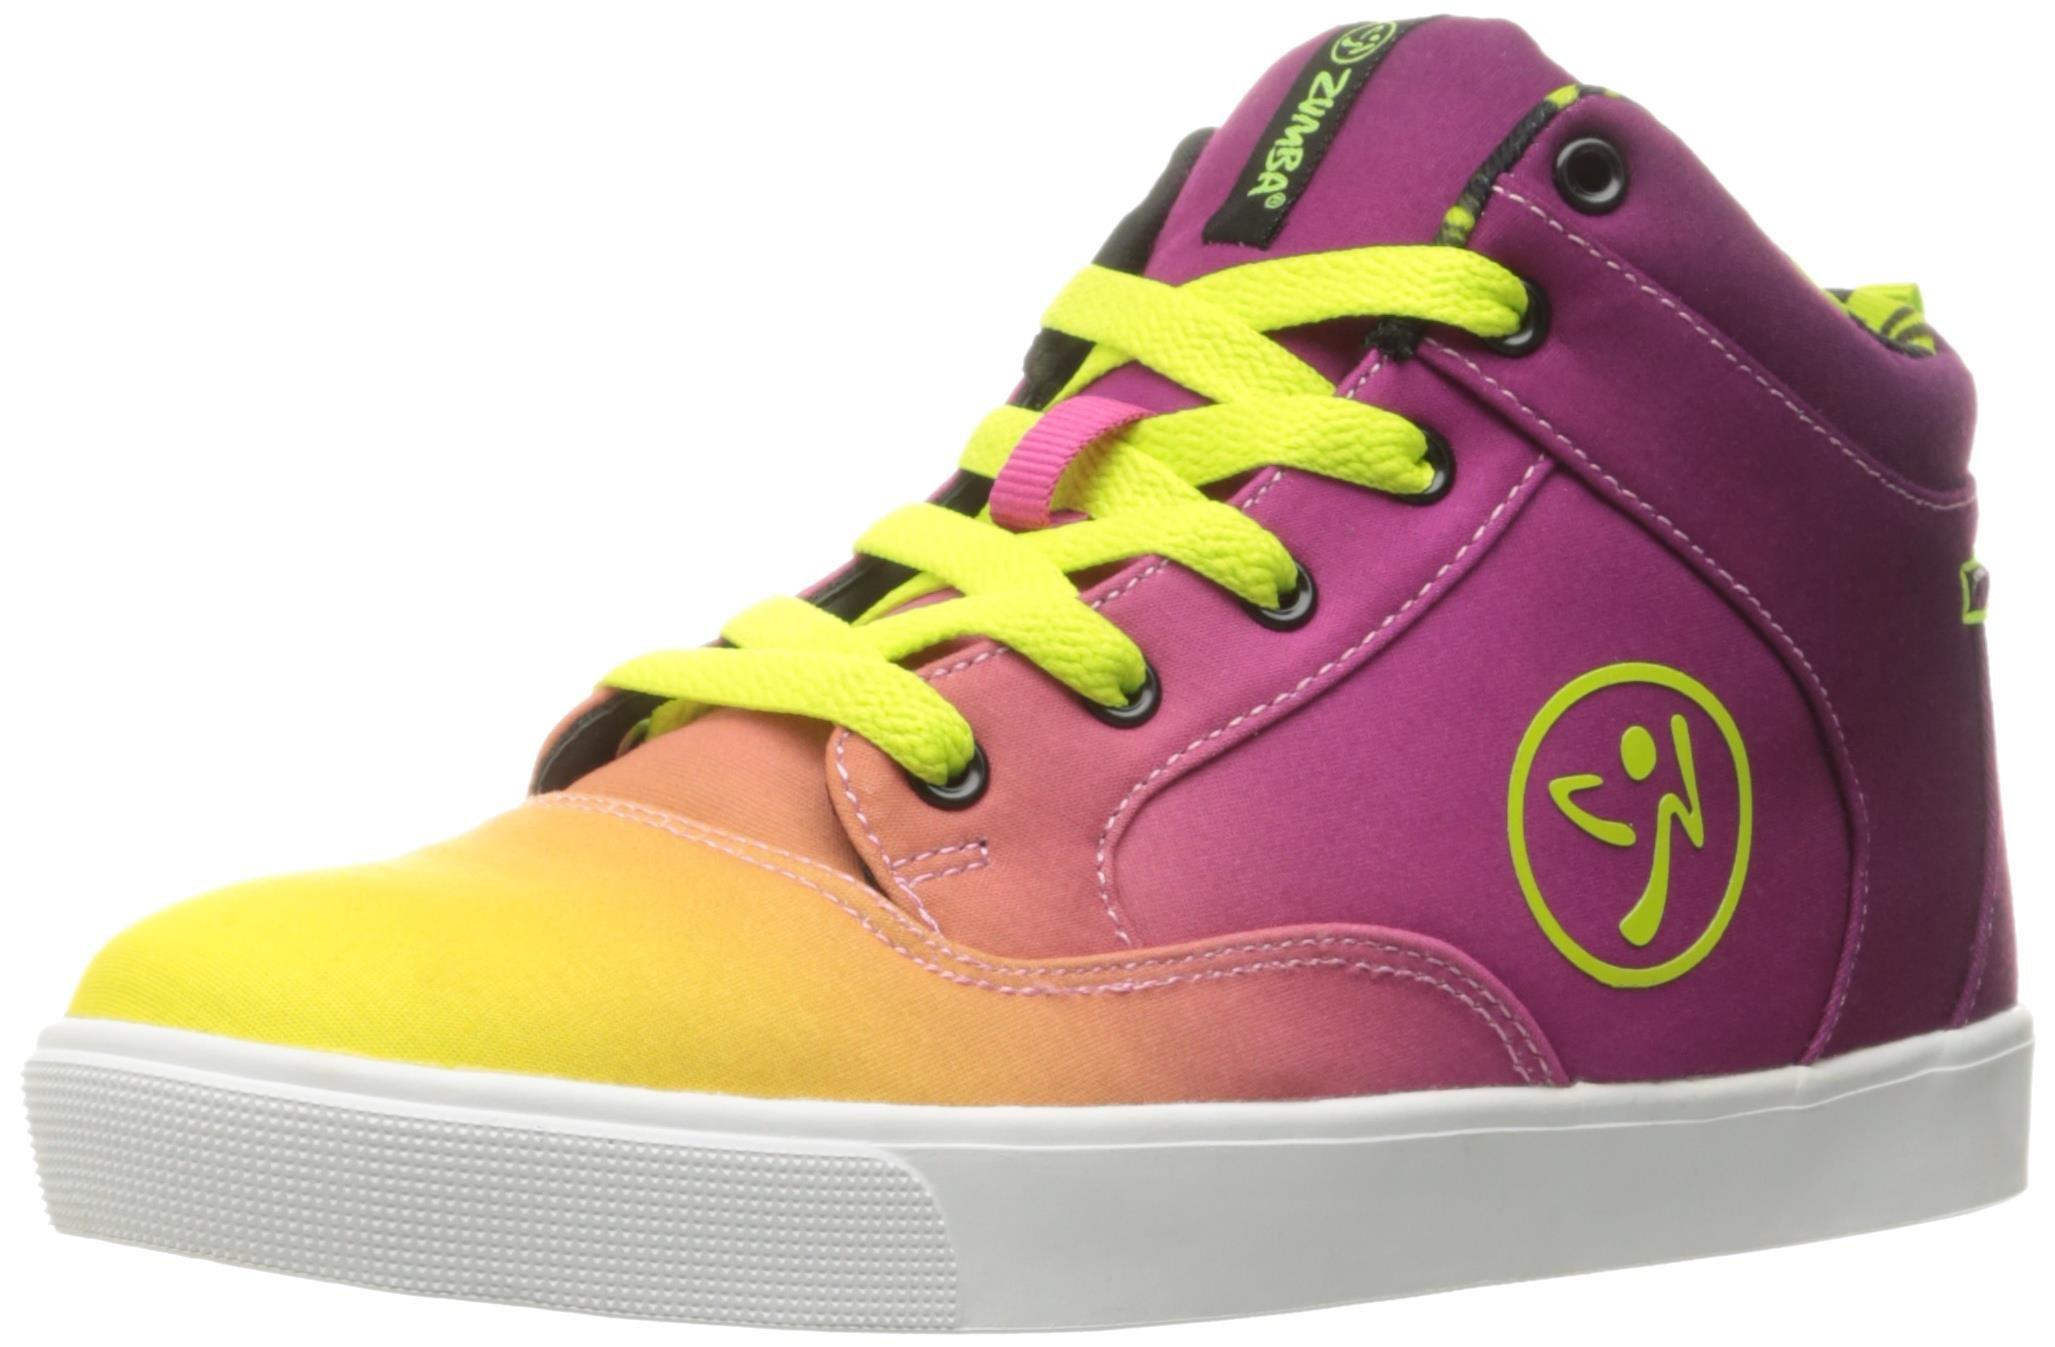 Zumba Women's Rio Street Fresh Dance Shoe, Purple, 7 M US